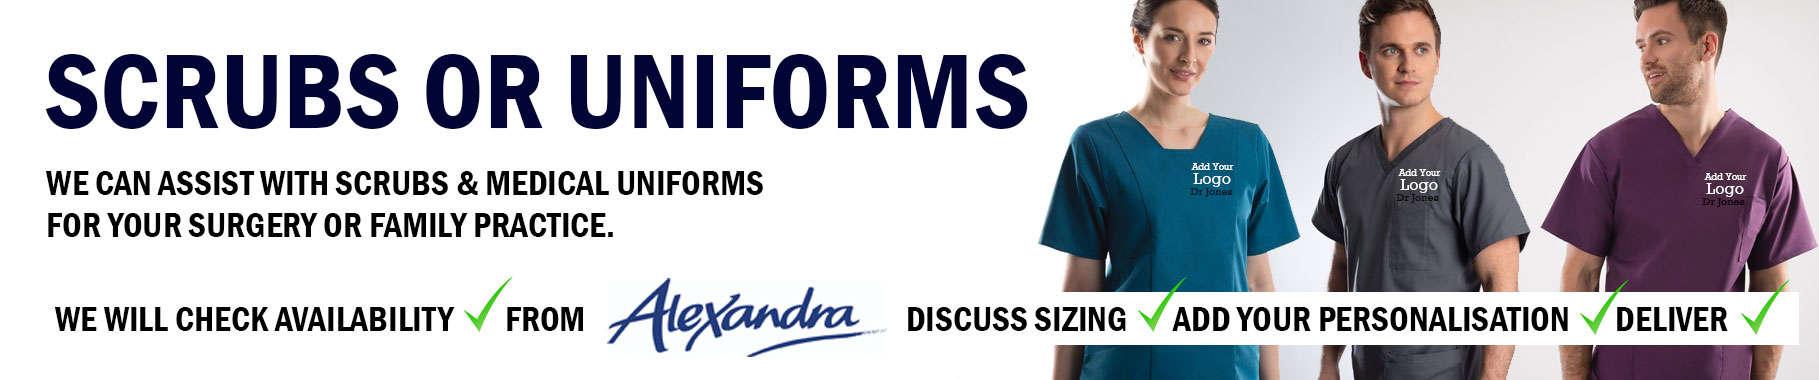 Medical Scrubs and Uniform from Alexandra